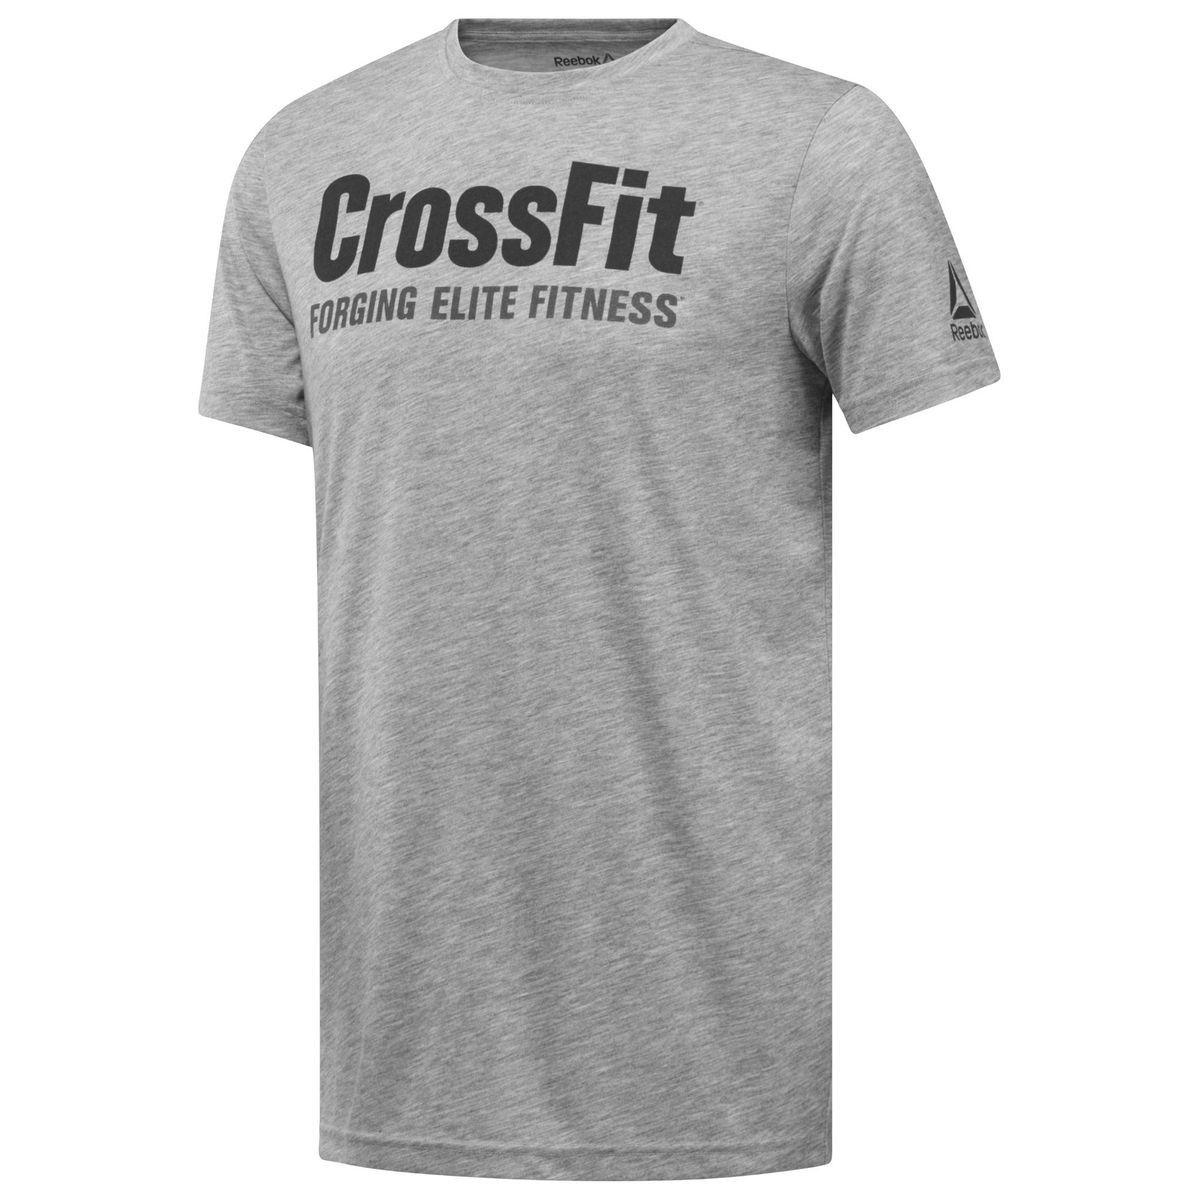 T shirt Reebok Crossfit Speedwick F.e.f T shirt Graphic